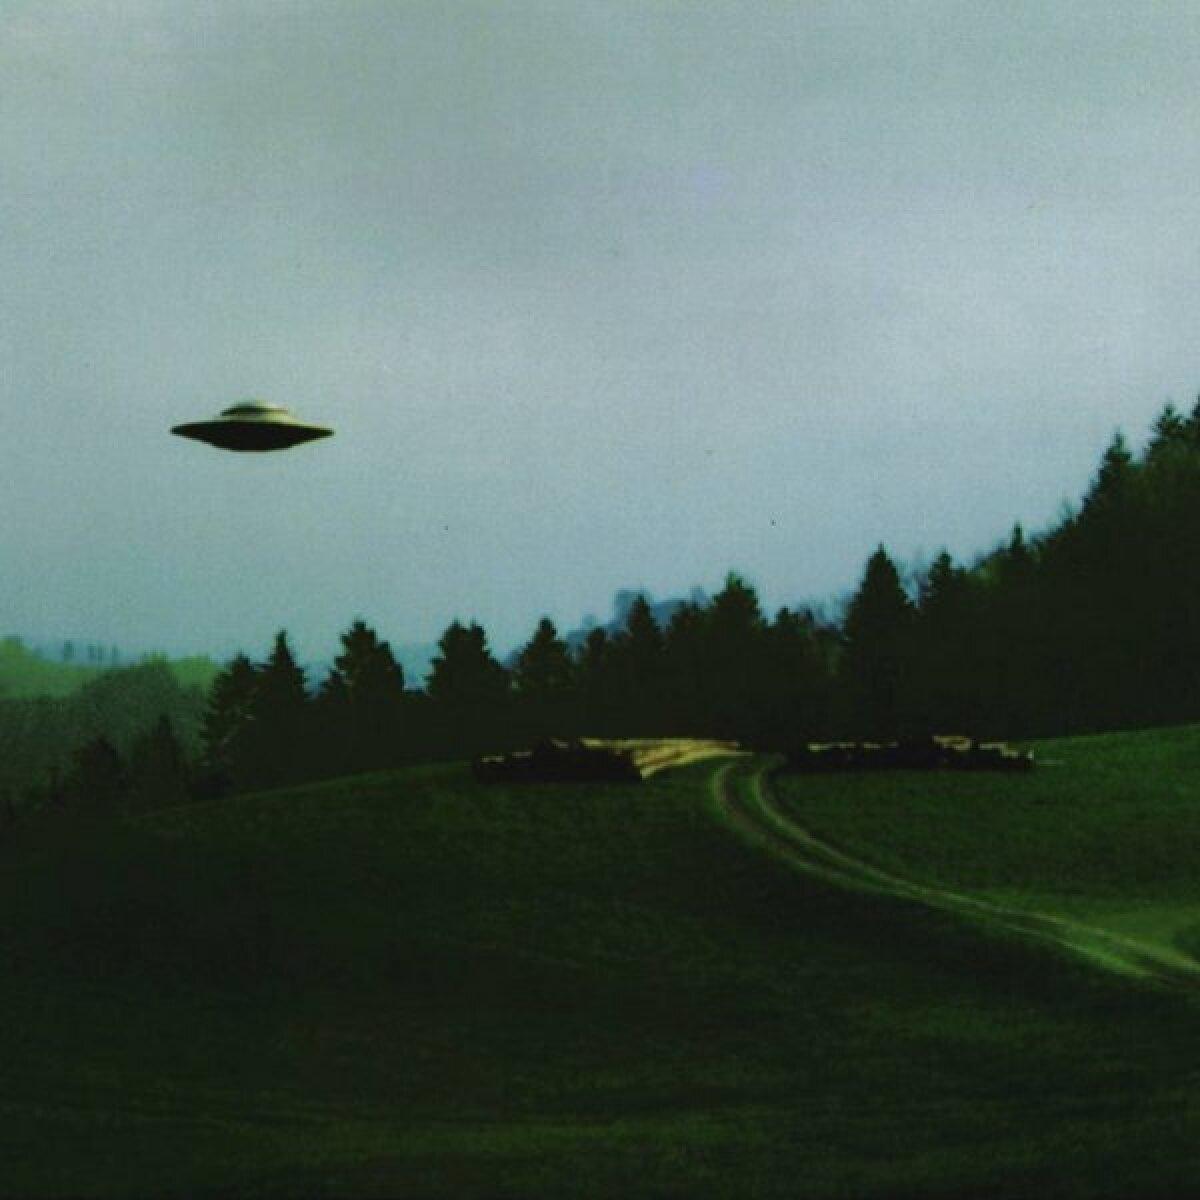 https://gnnaz.com/2013/07/11/conspiracy-weekly-bad-ufo-photos